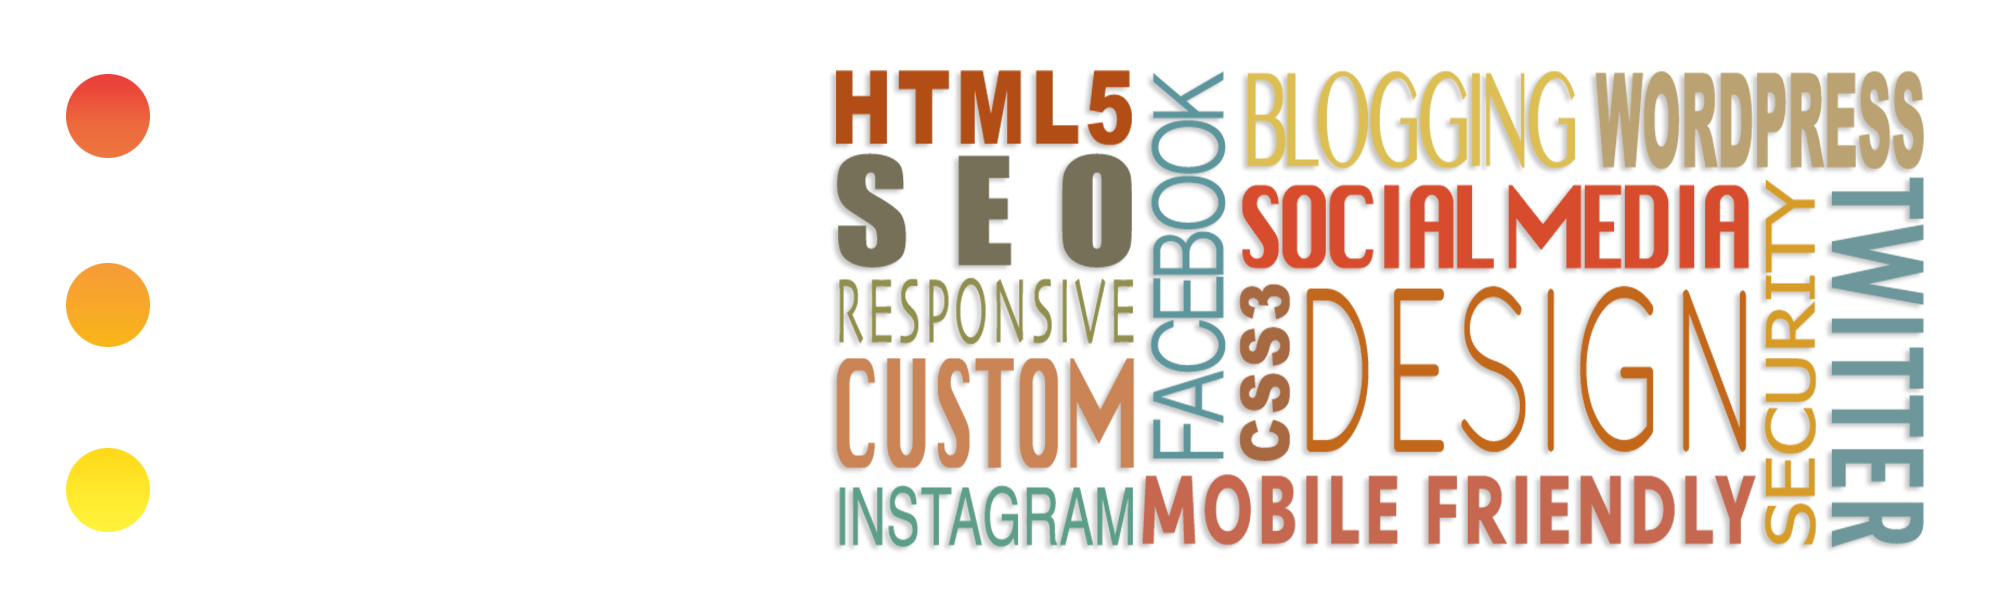 custom wordpresswebsites, social media integration, sep, blogging and more